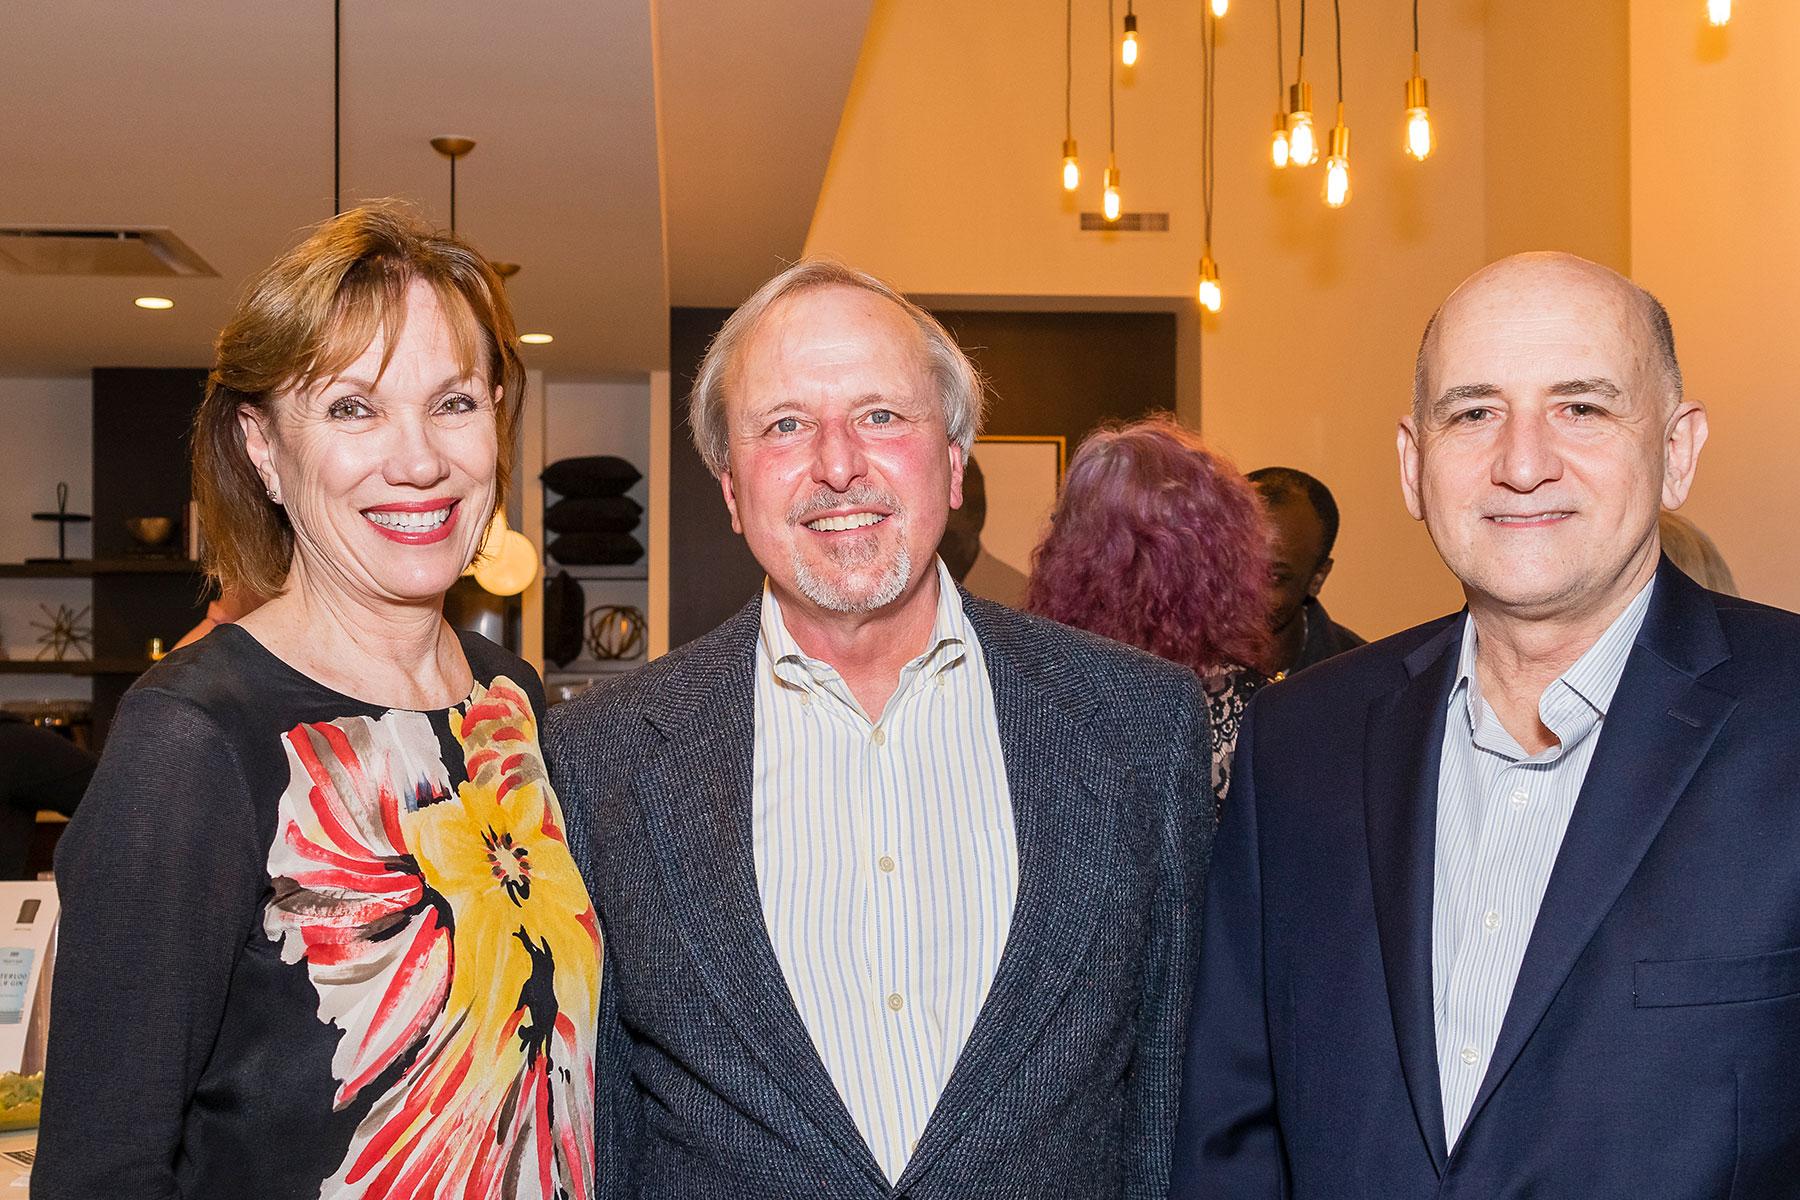 PH President Deborah Keyser, Jim McCallum, PH Executive Director David Bush